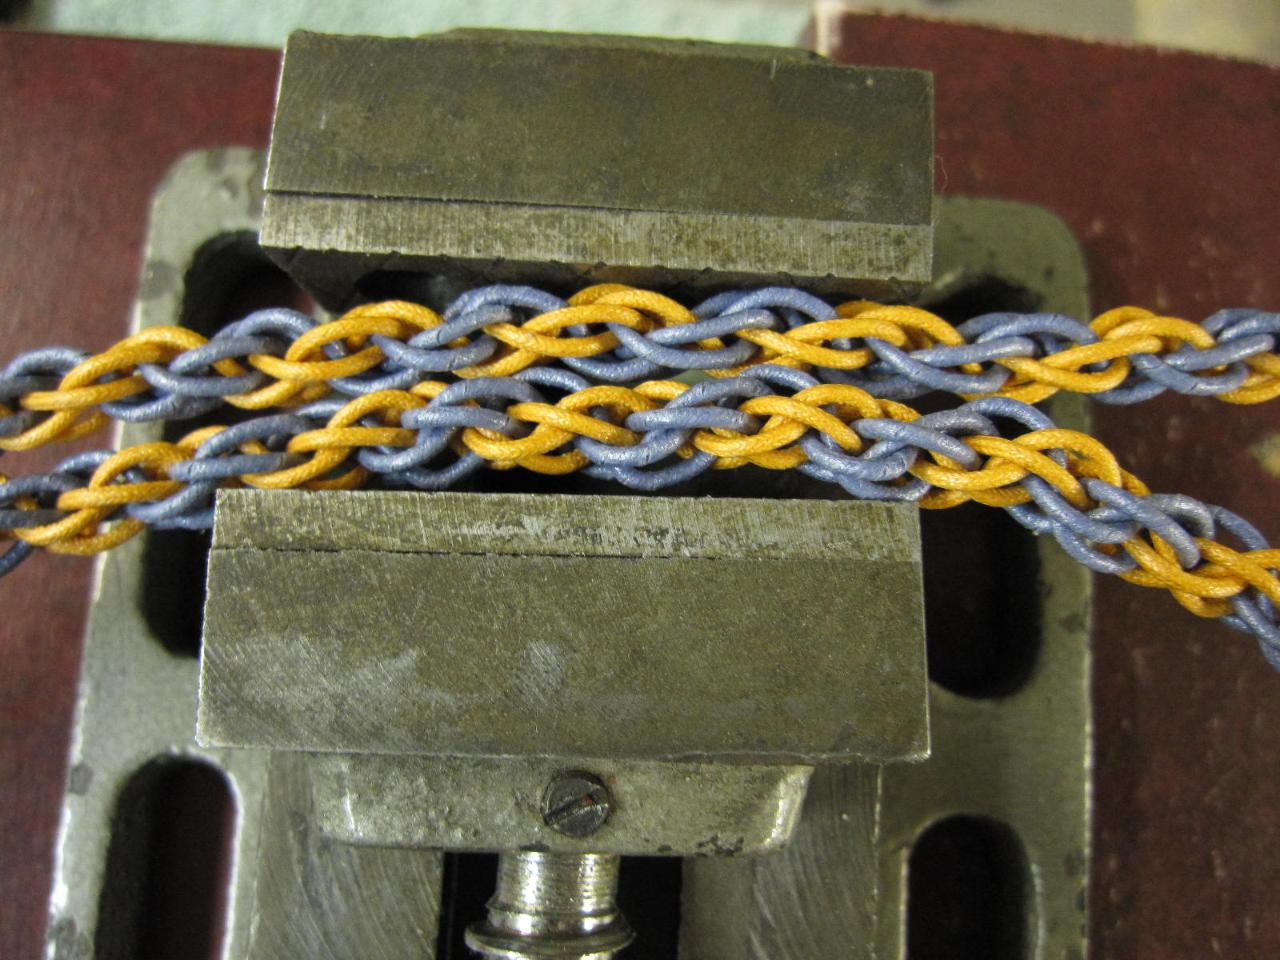 8 strand braid